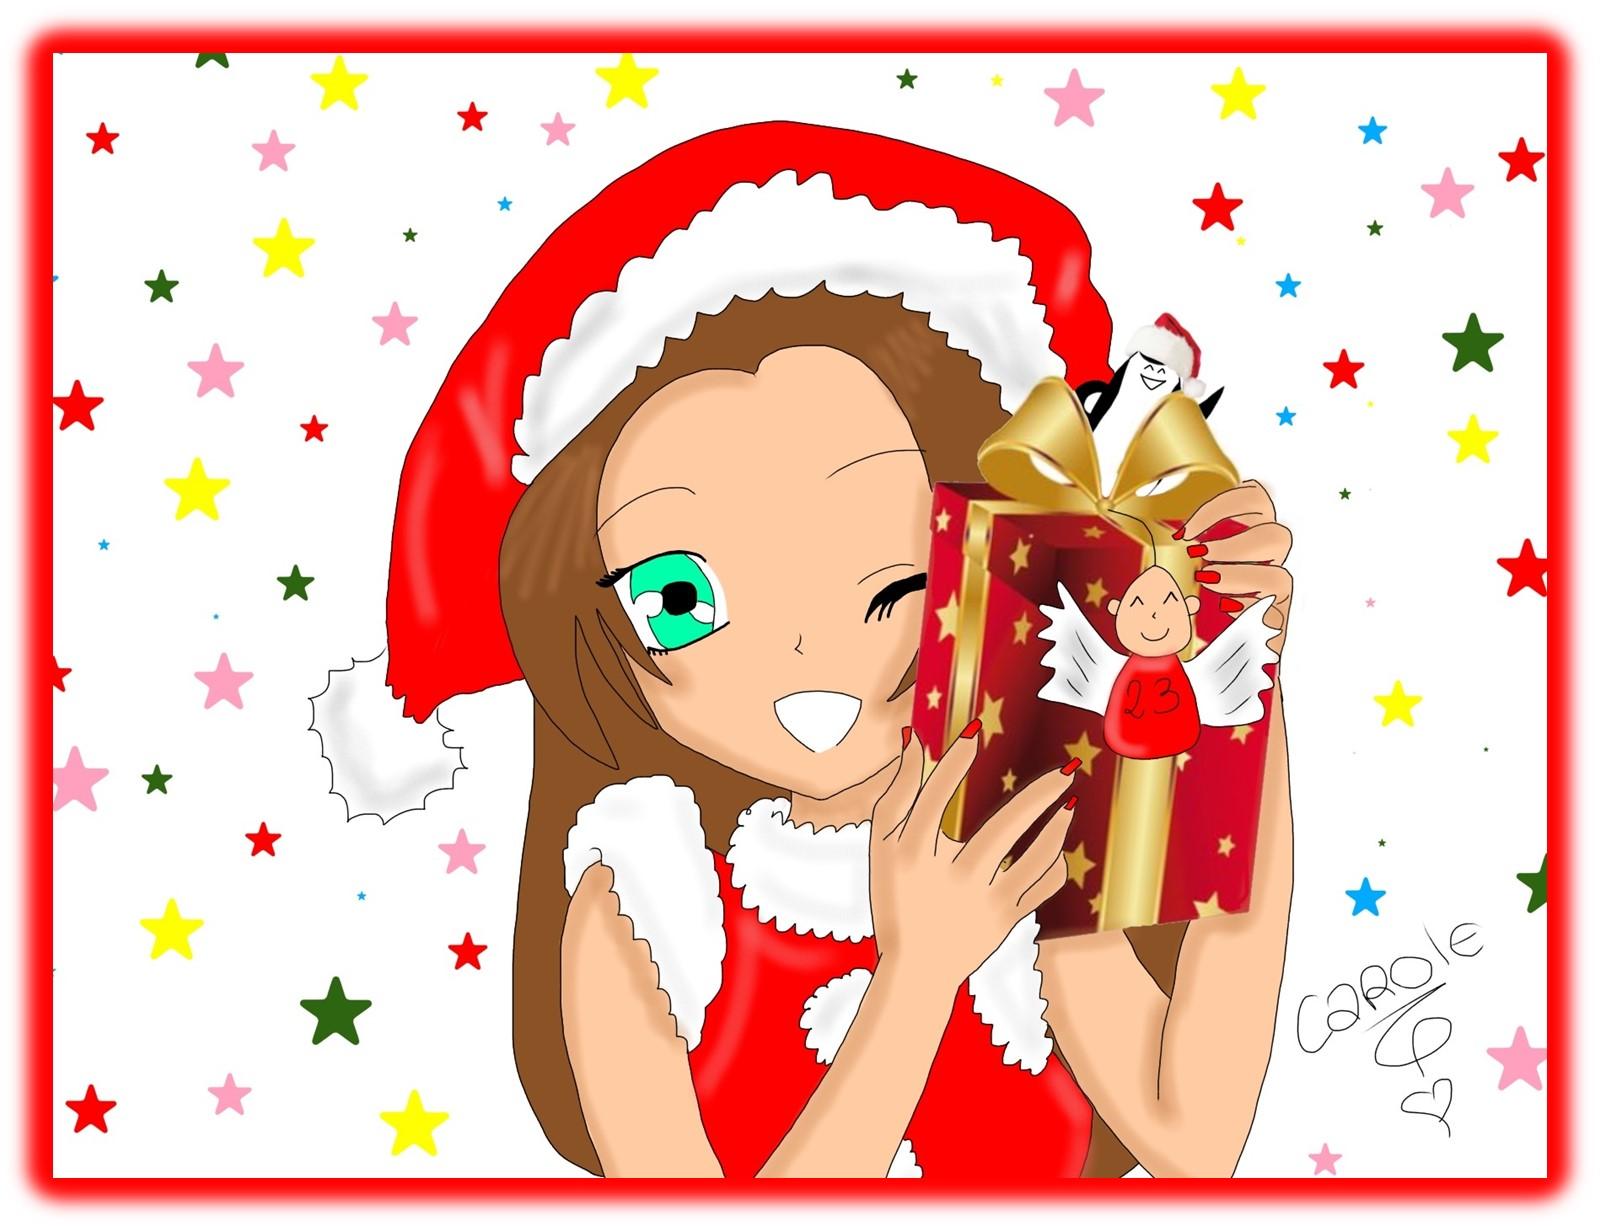 x-mas-style-merry-christmas-2013